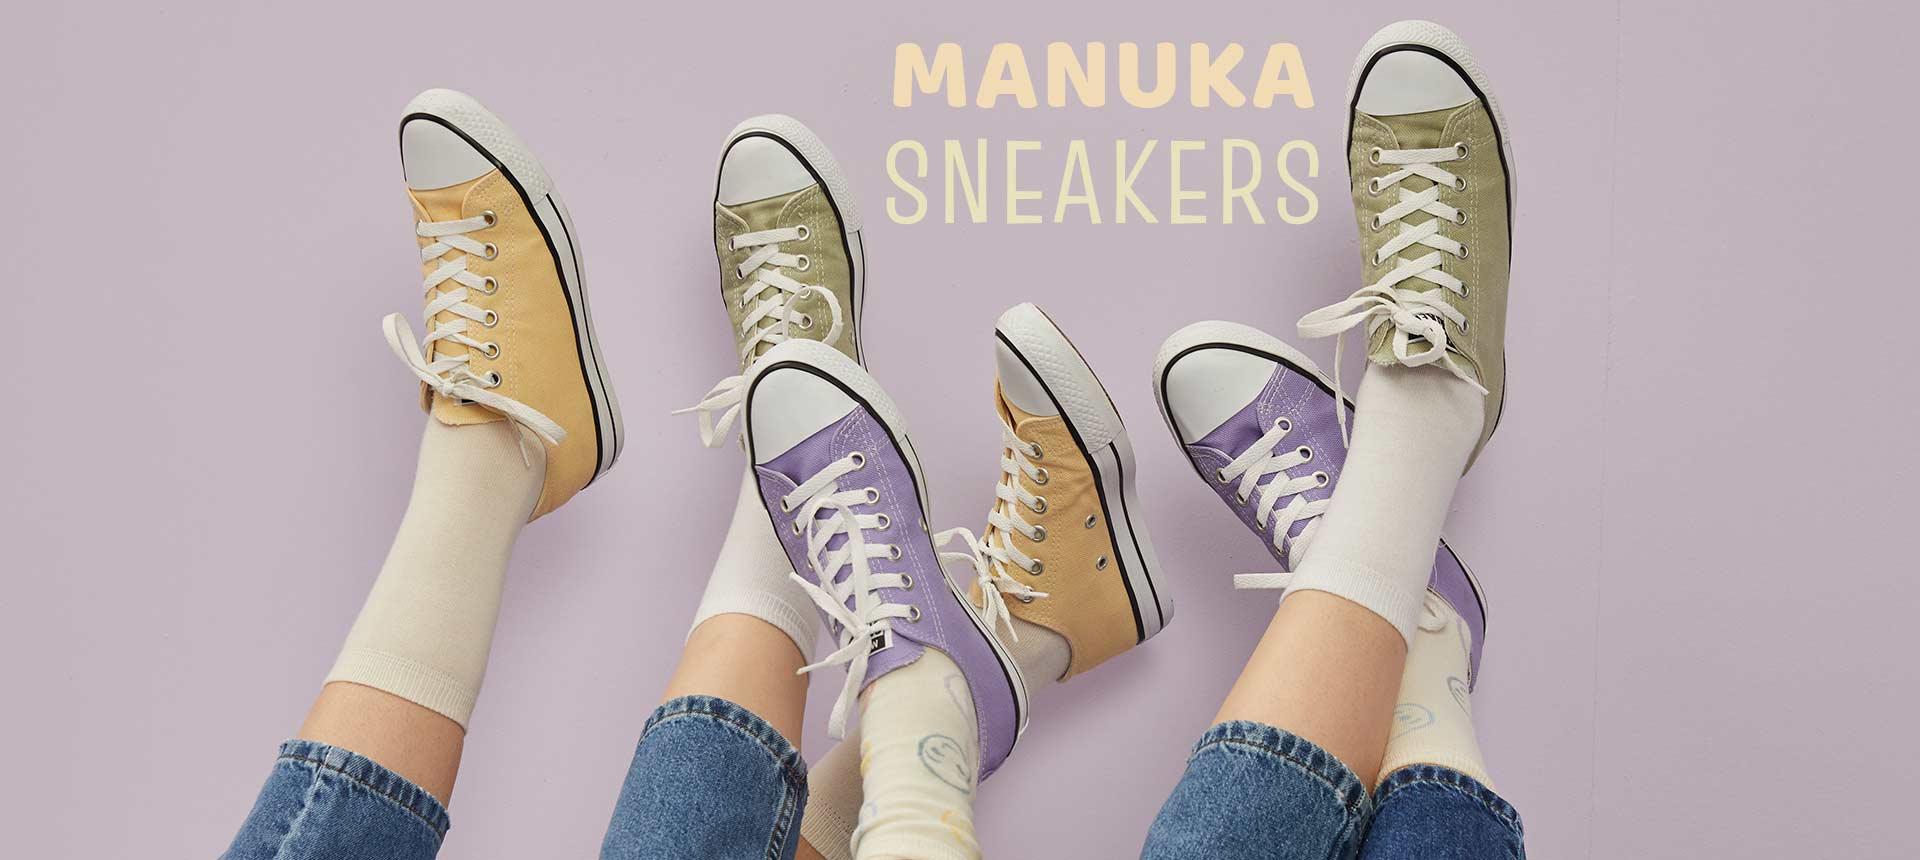 Manuka Sneakers